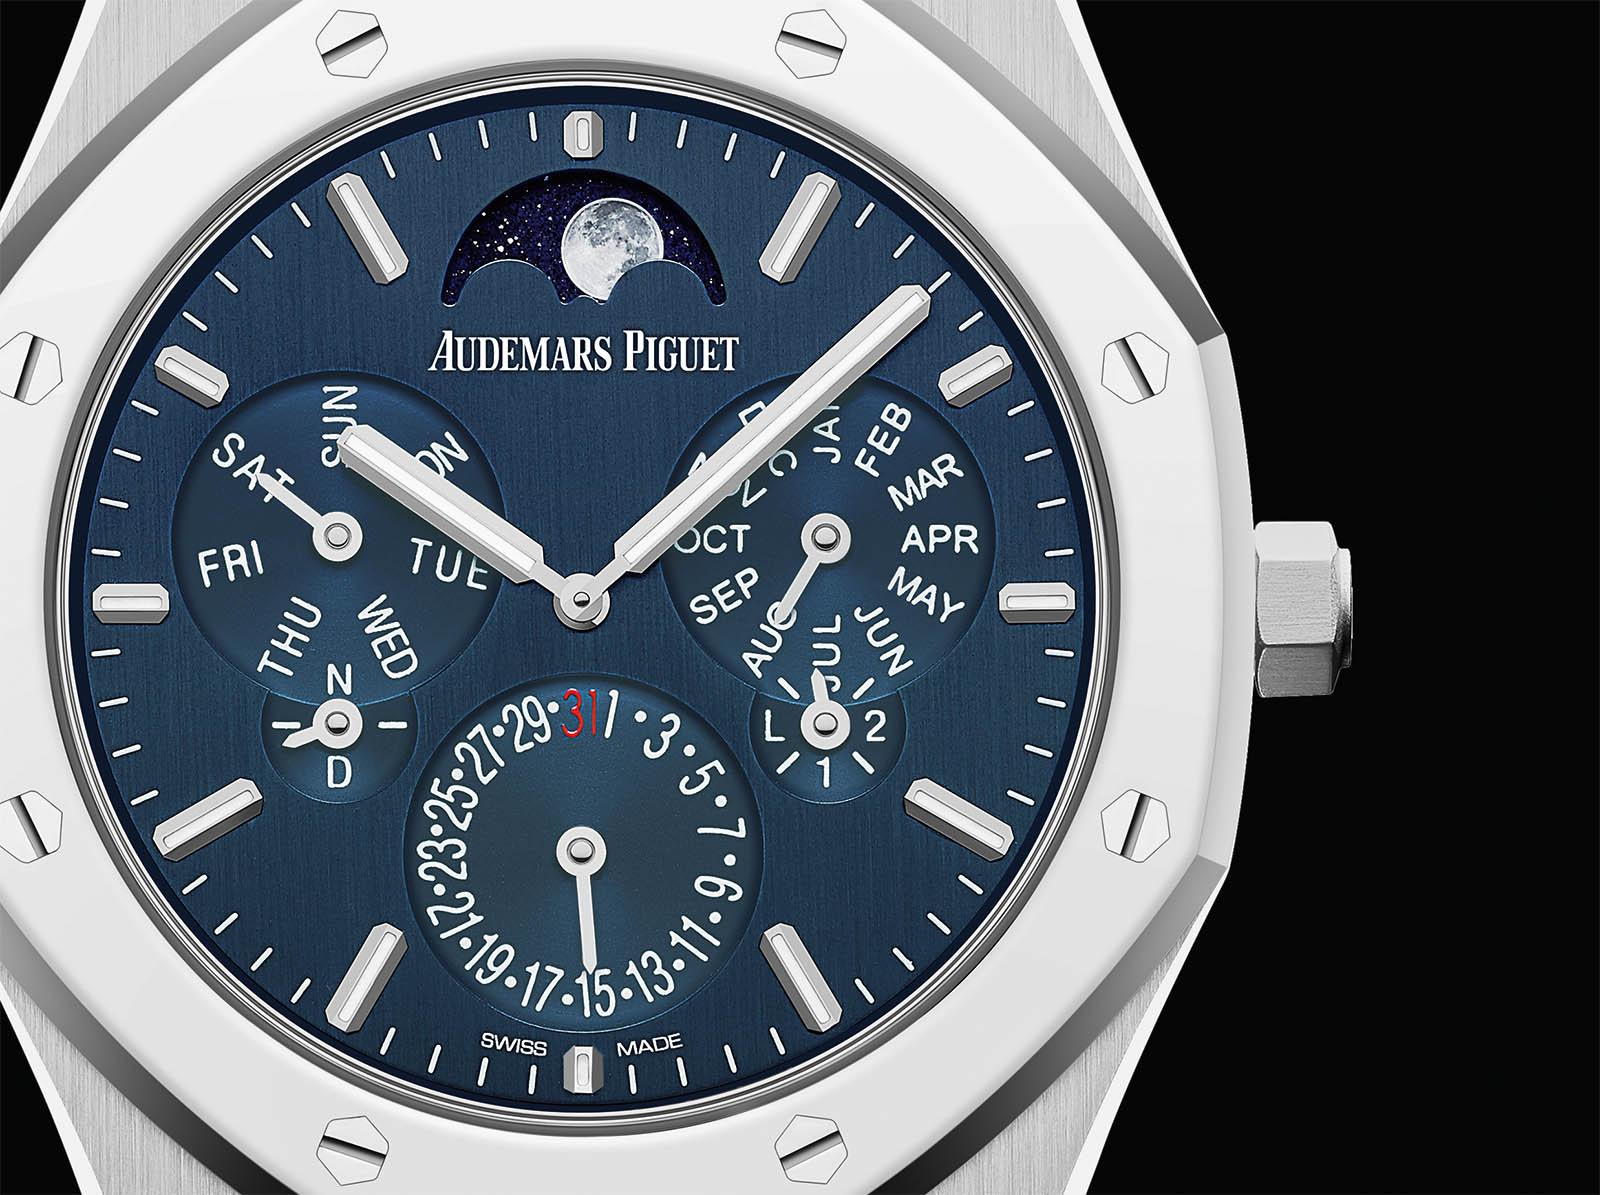 Audemars Piguet Royal Oak Selfwinding Perpetual Calendar Ultra-Thin 5